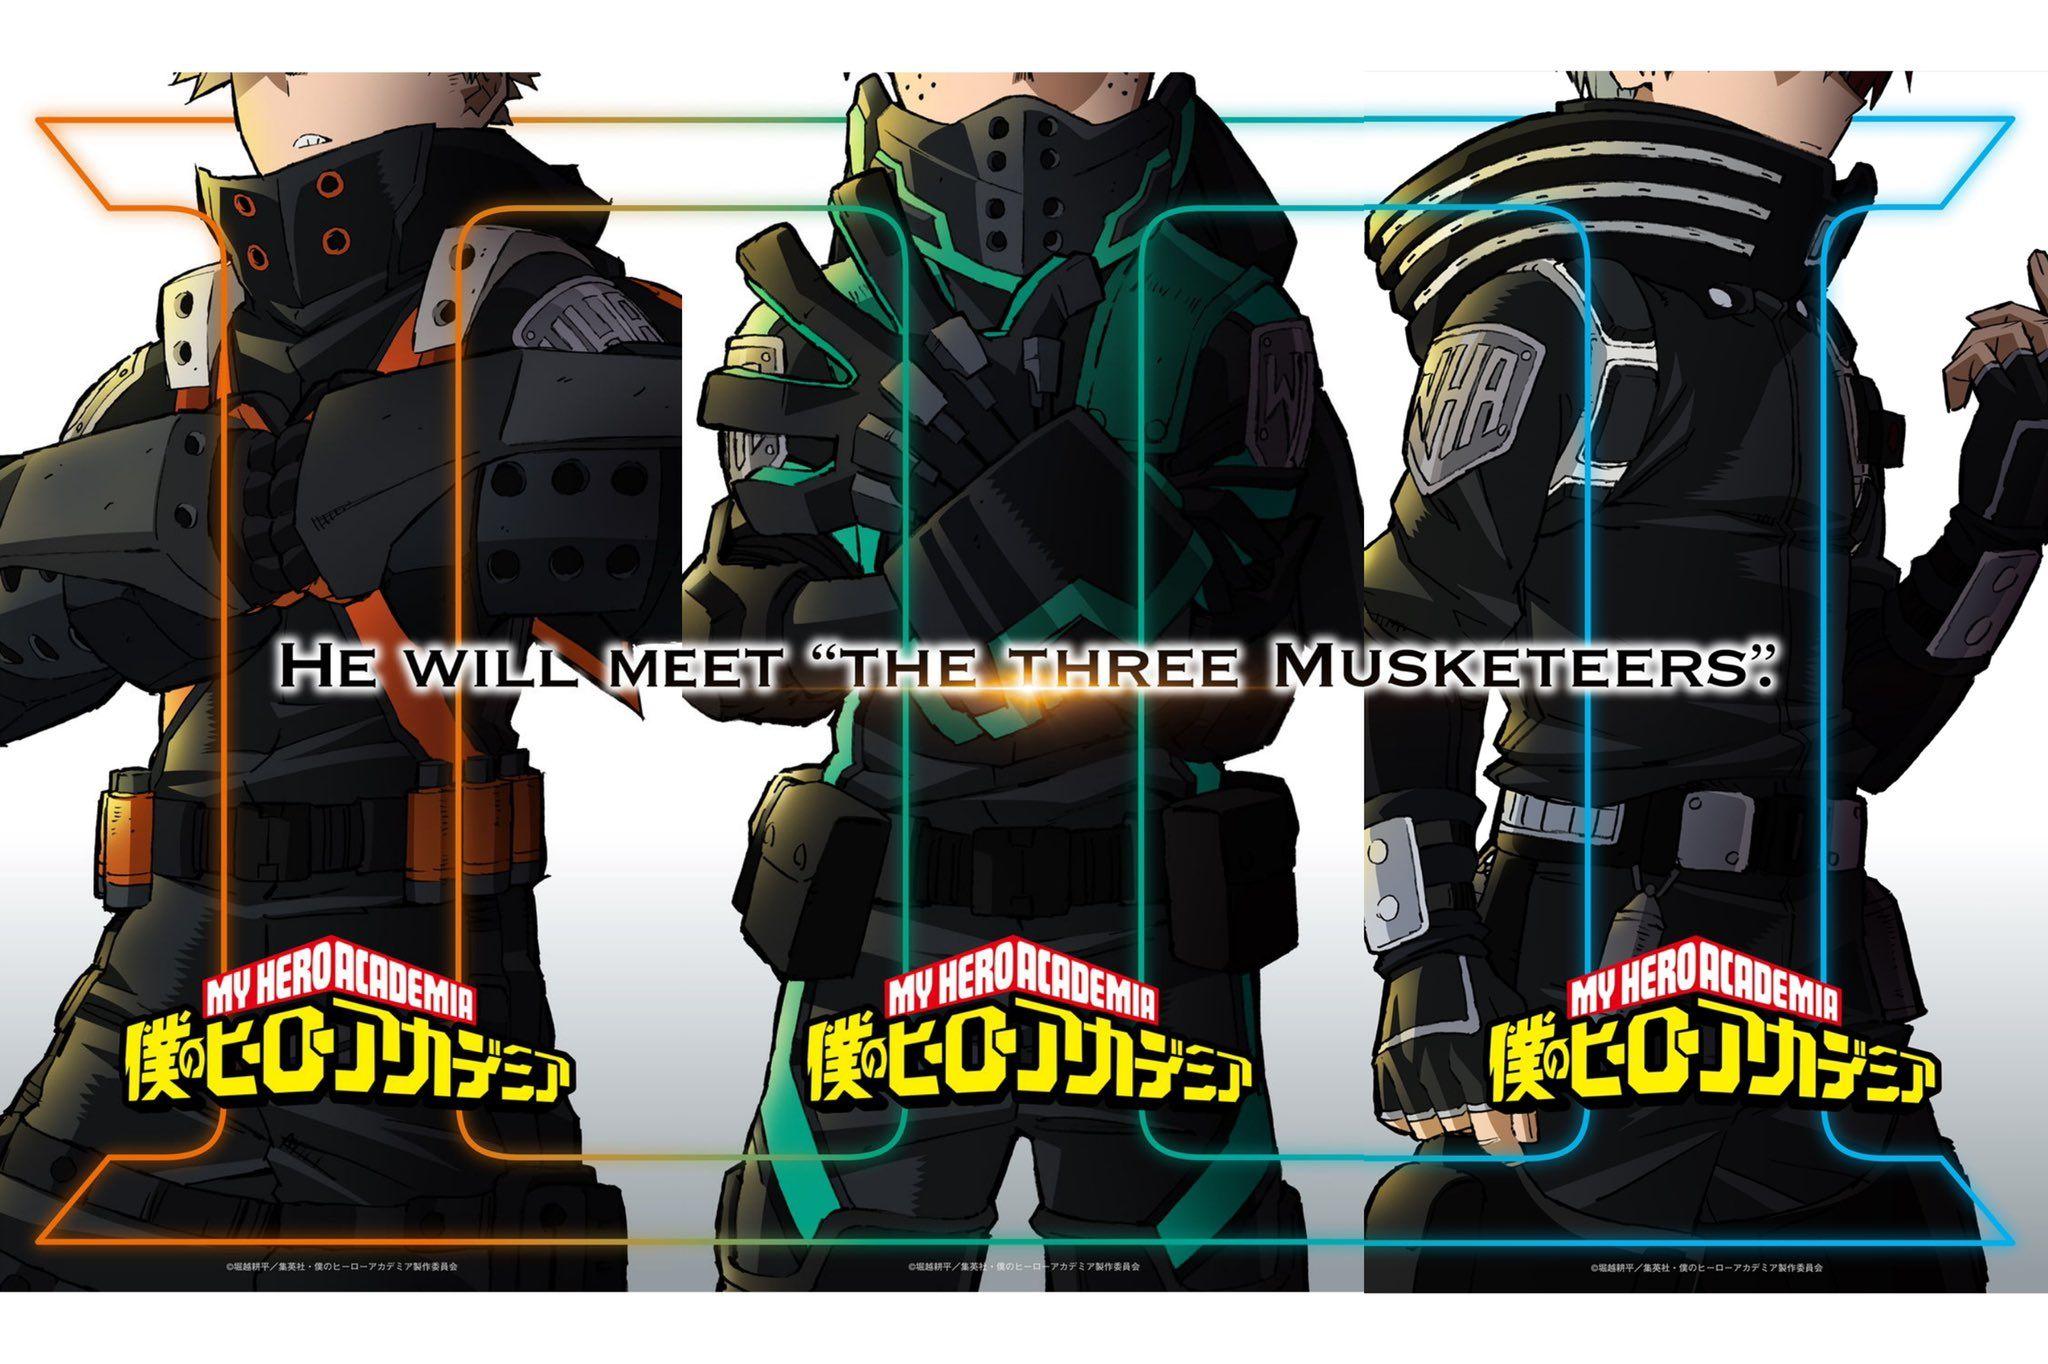 My Hero Academia Movie 3 Has Been Announced With A Key Visual The Three Musketeers Hero Movie My Hero Academia